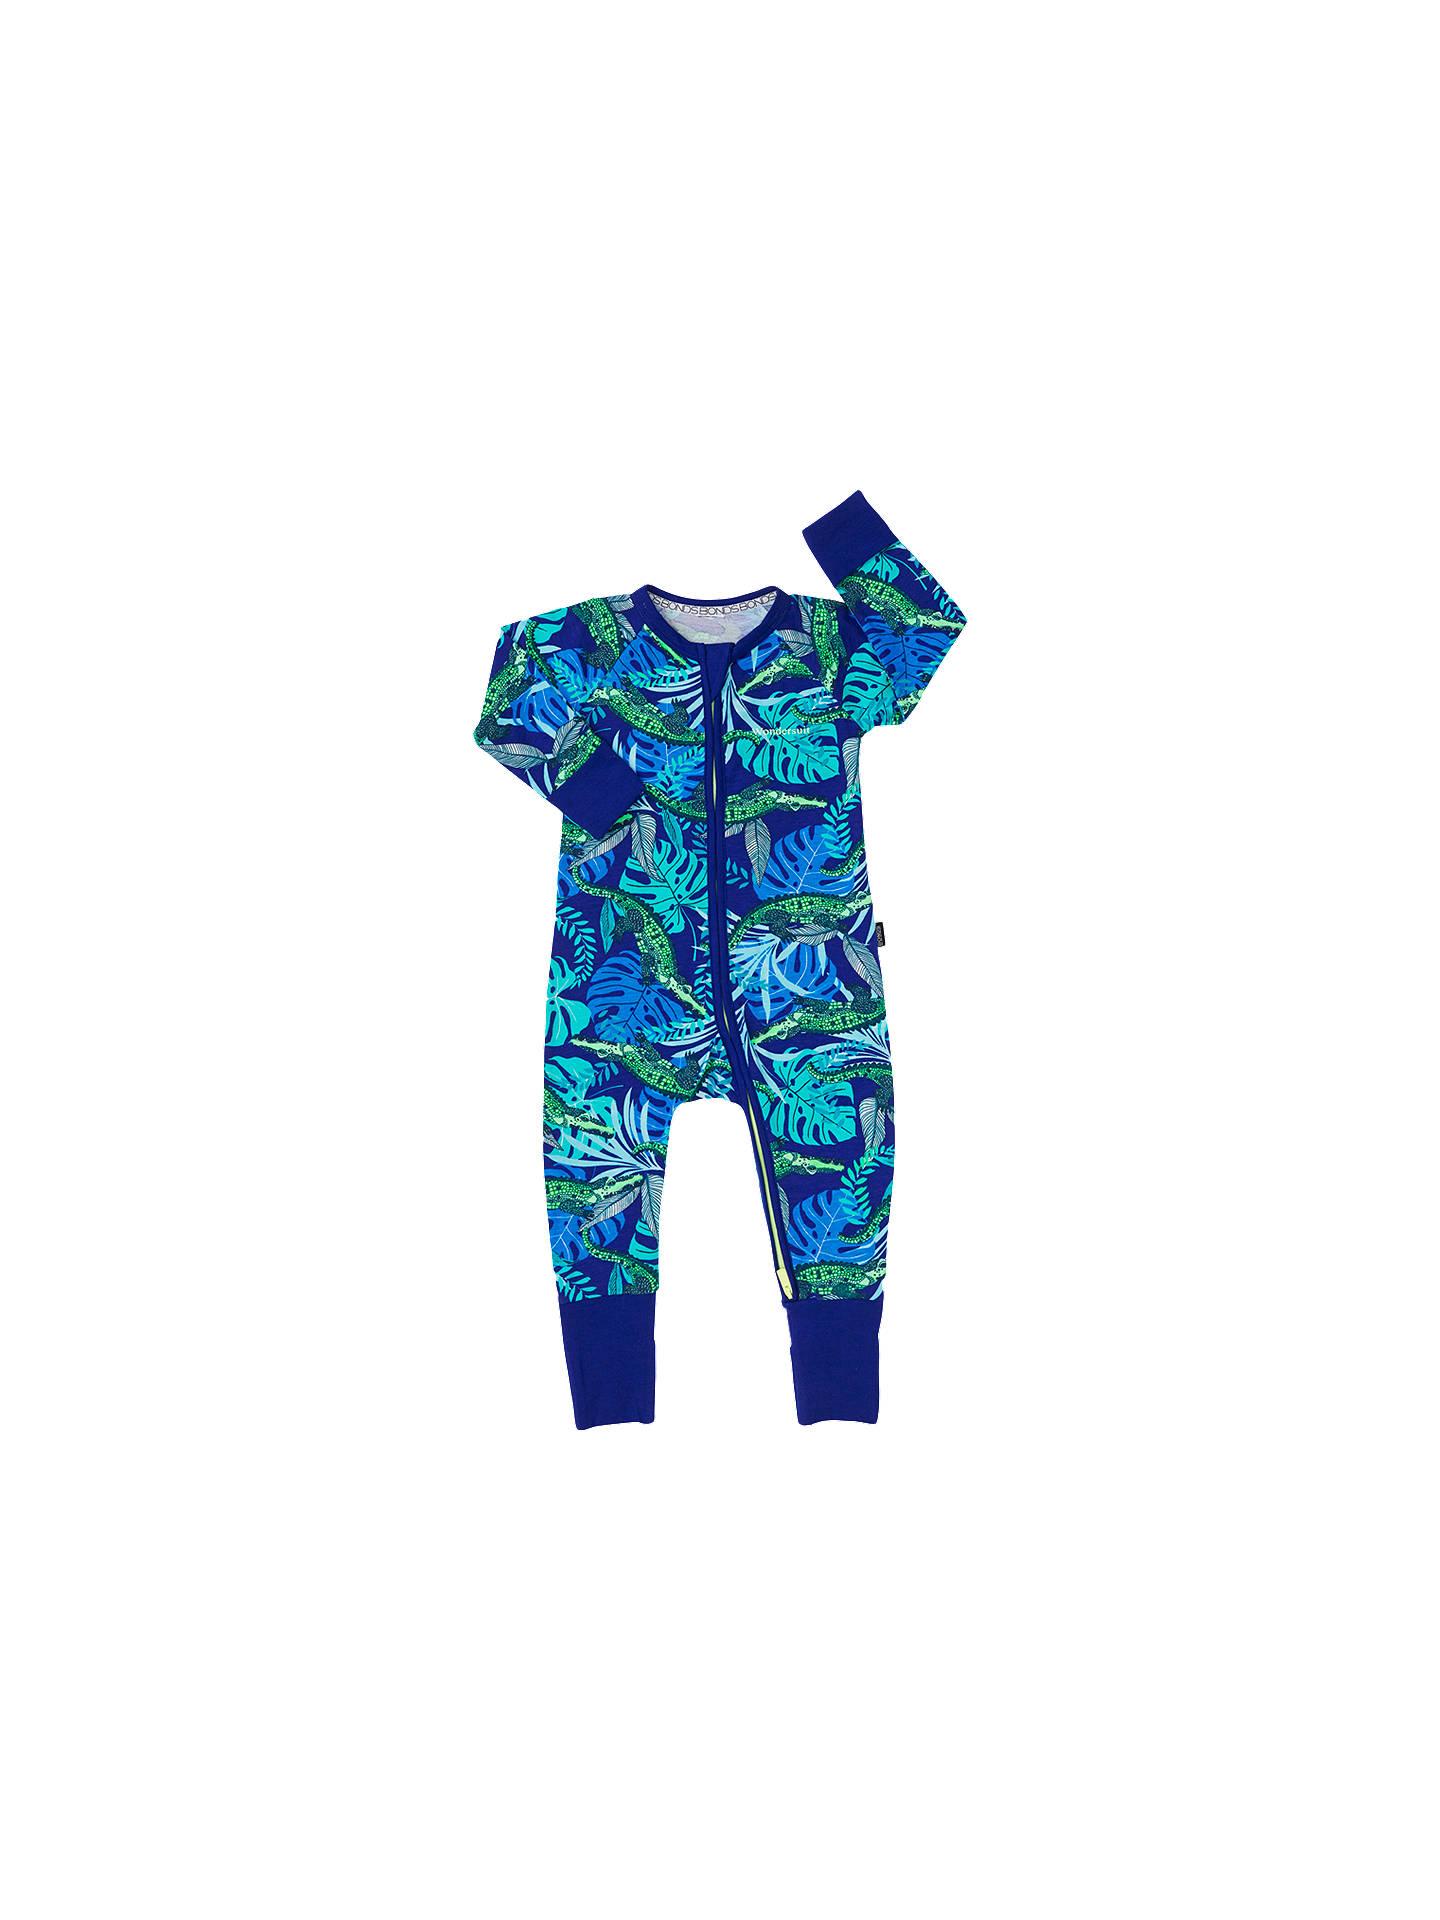 Buy Bonds Baby Ribby Airlie Croc Wondersuit, Blue, Green, Newborn Online at johnlewis ...